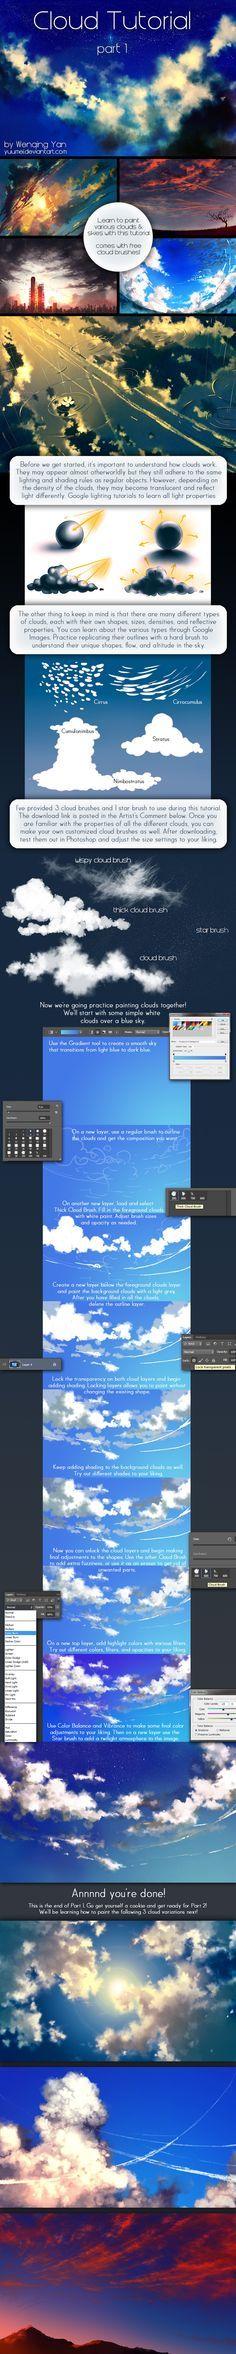 Cloud Tutorial Part 1 by yuumei.deviantart.com on #deviantART